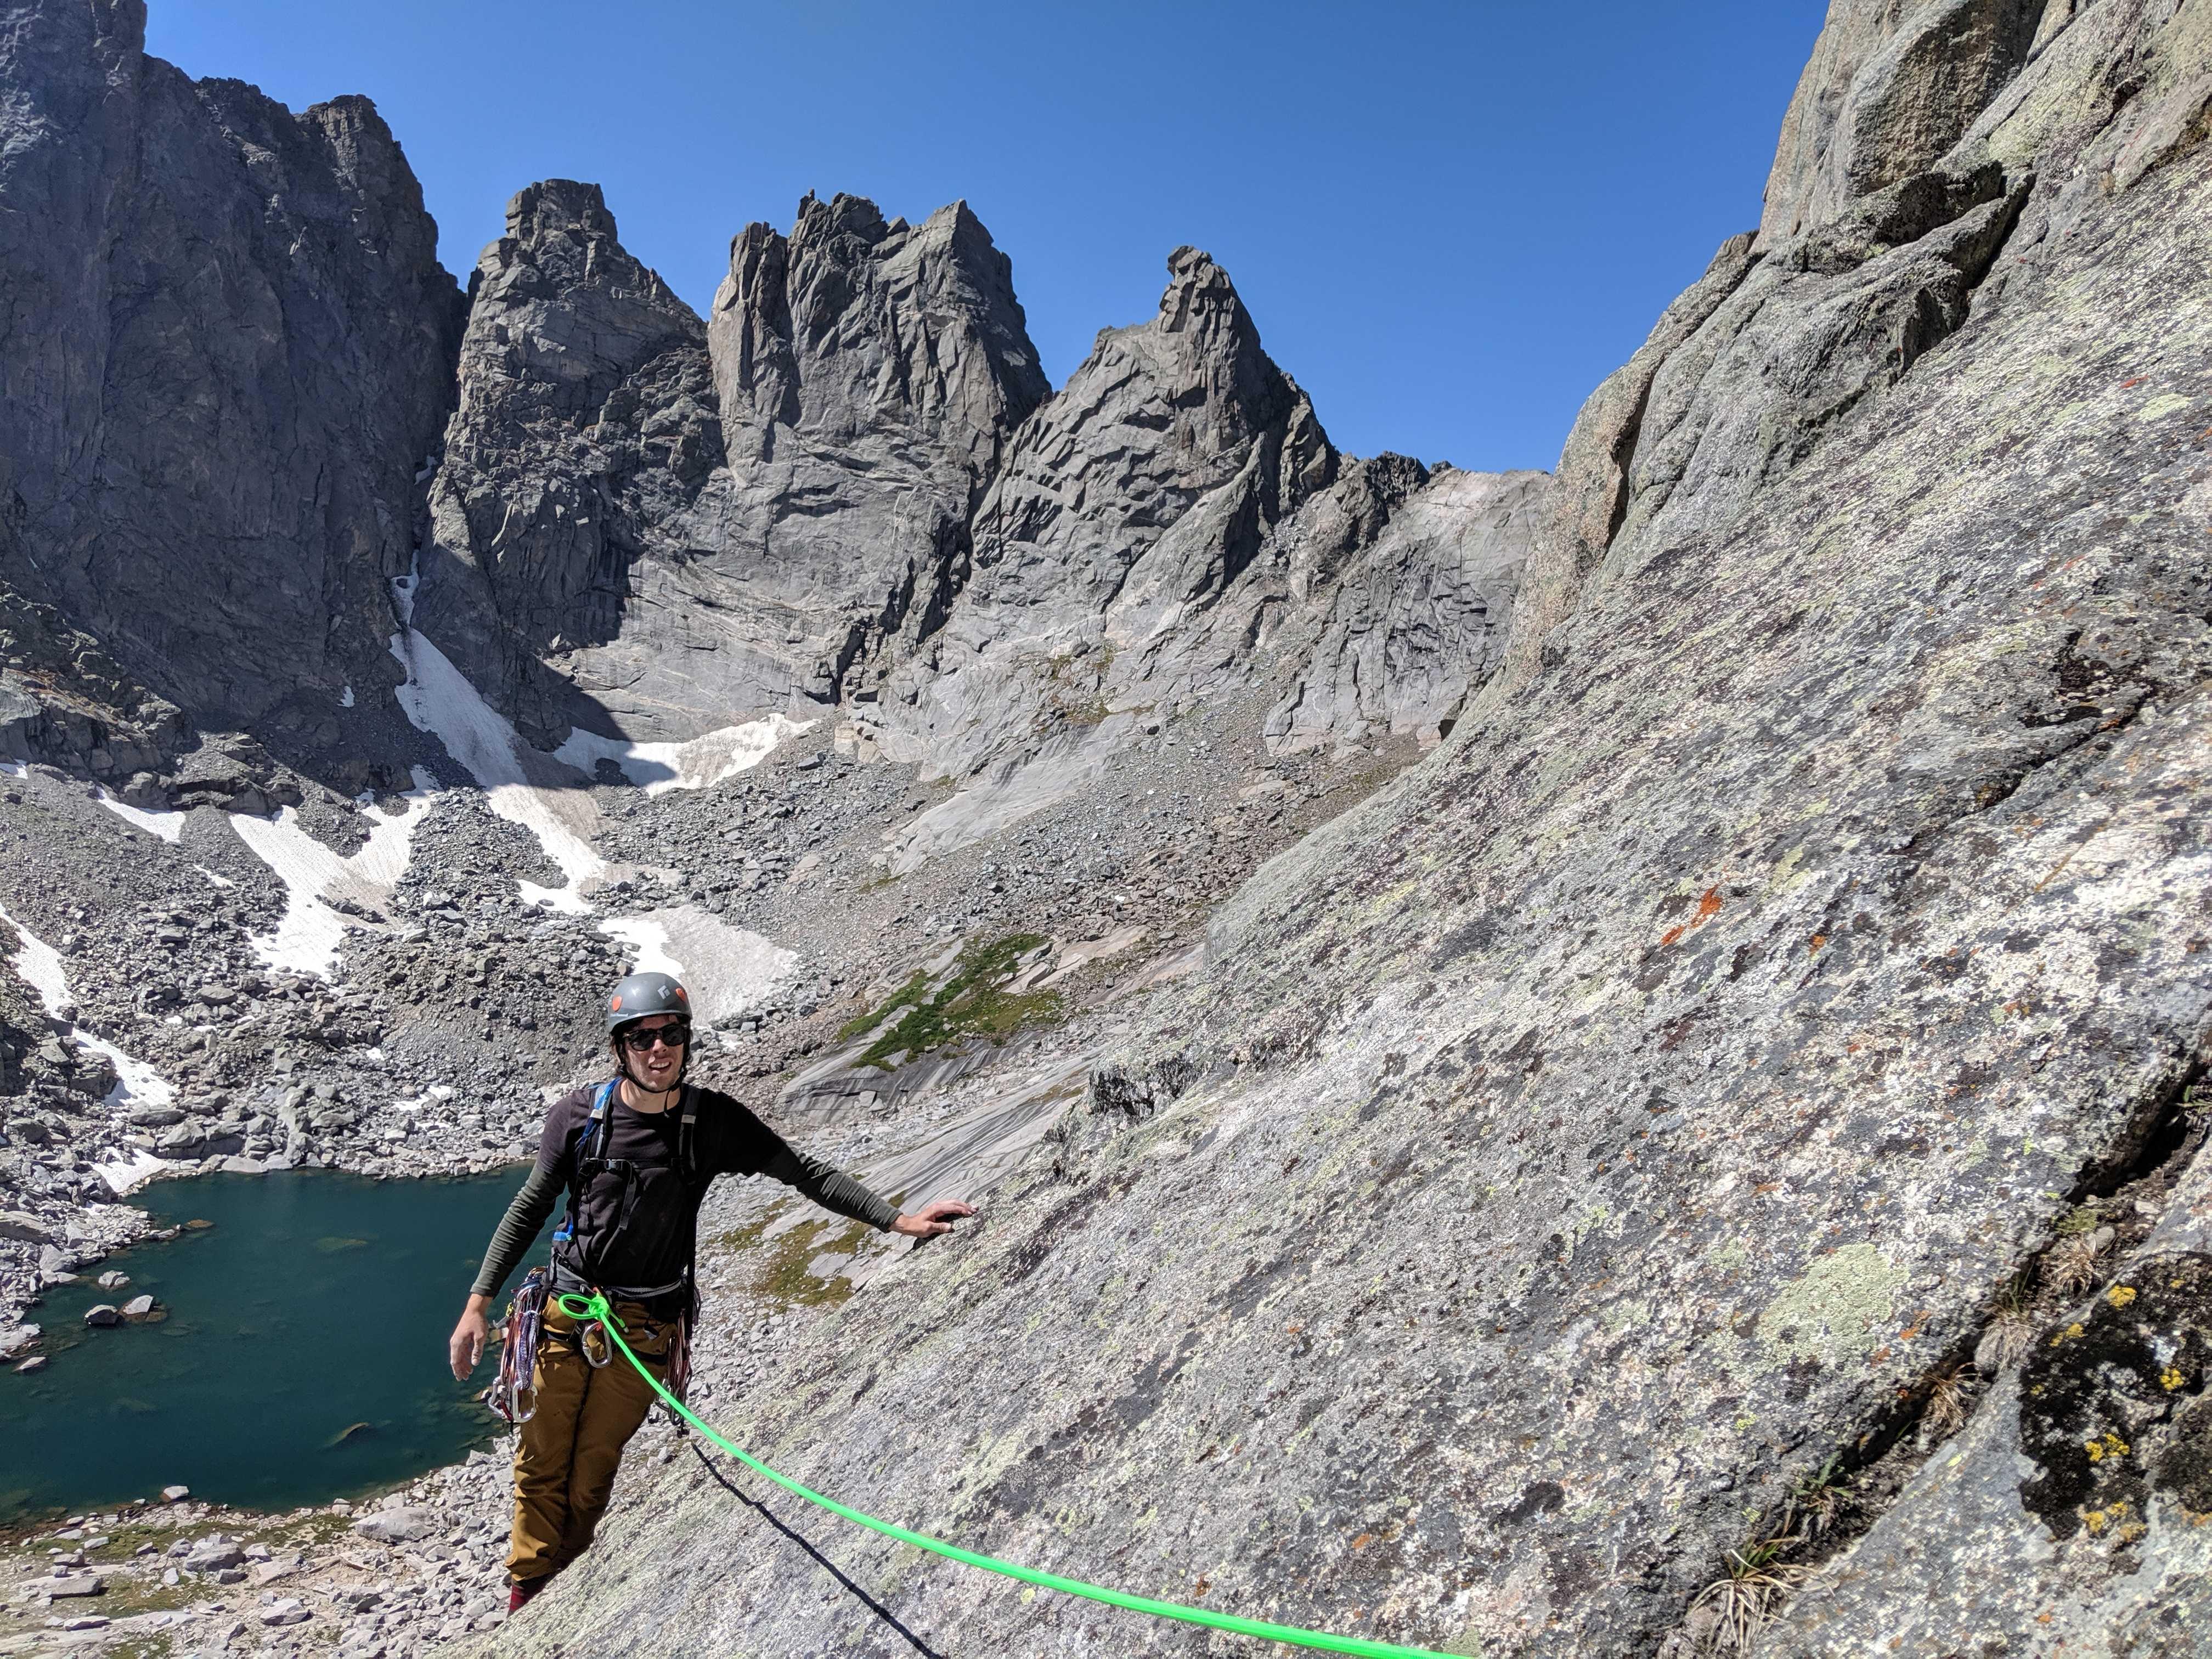 Wind River Range, WY, self portrait, climbing